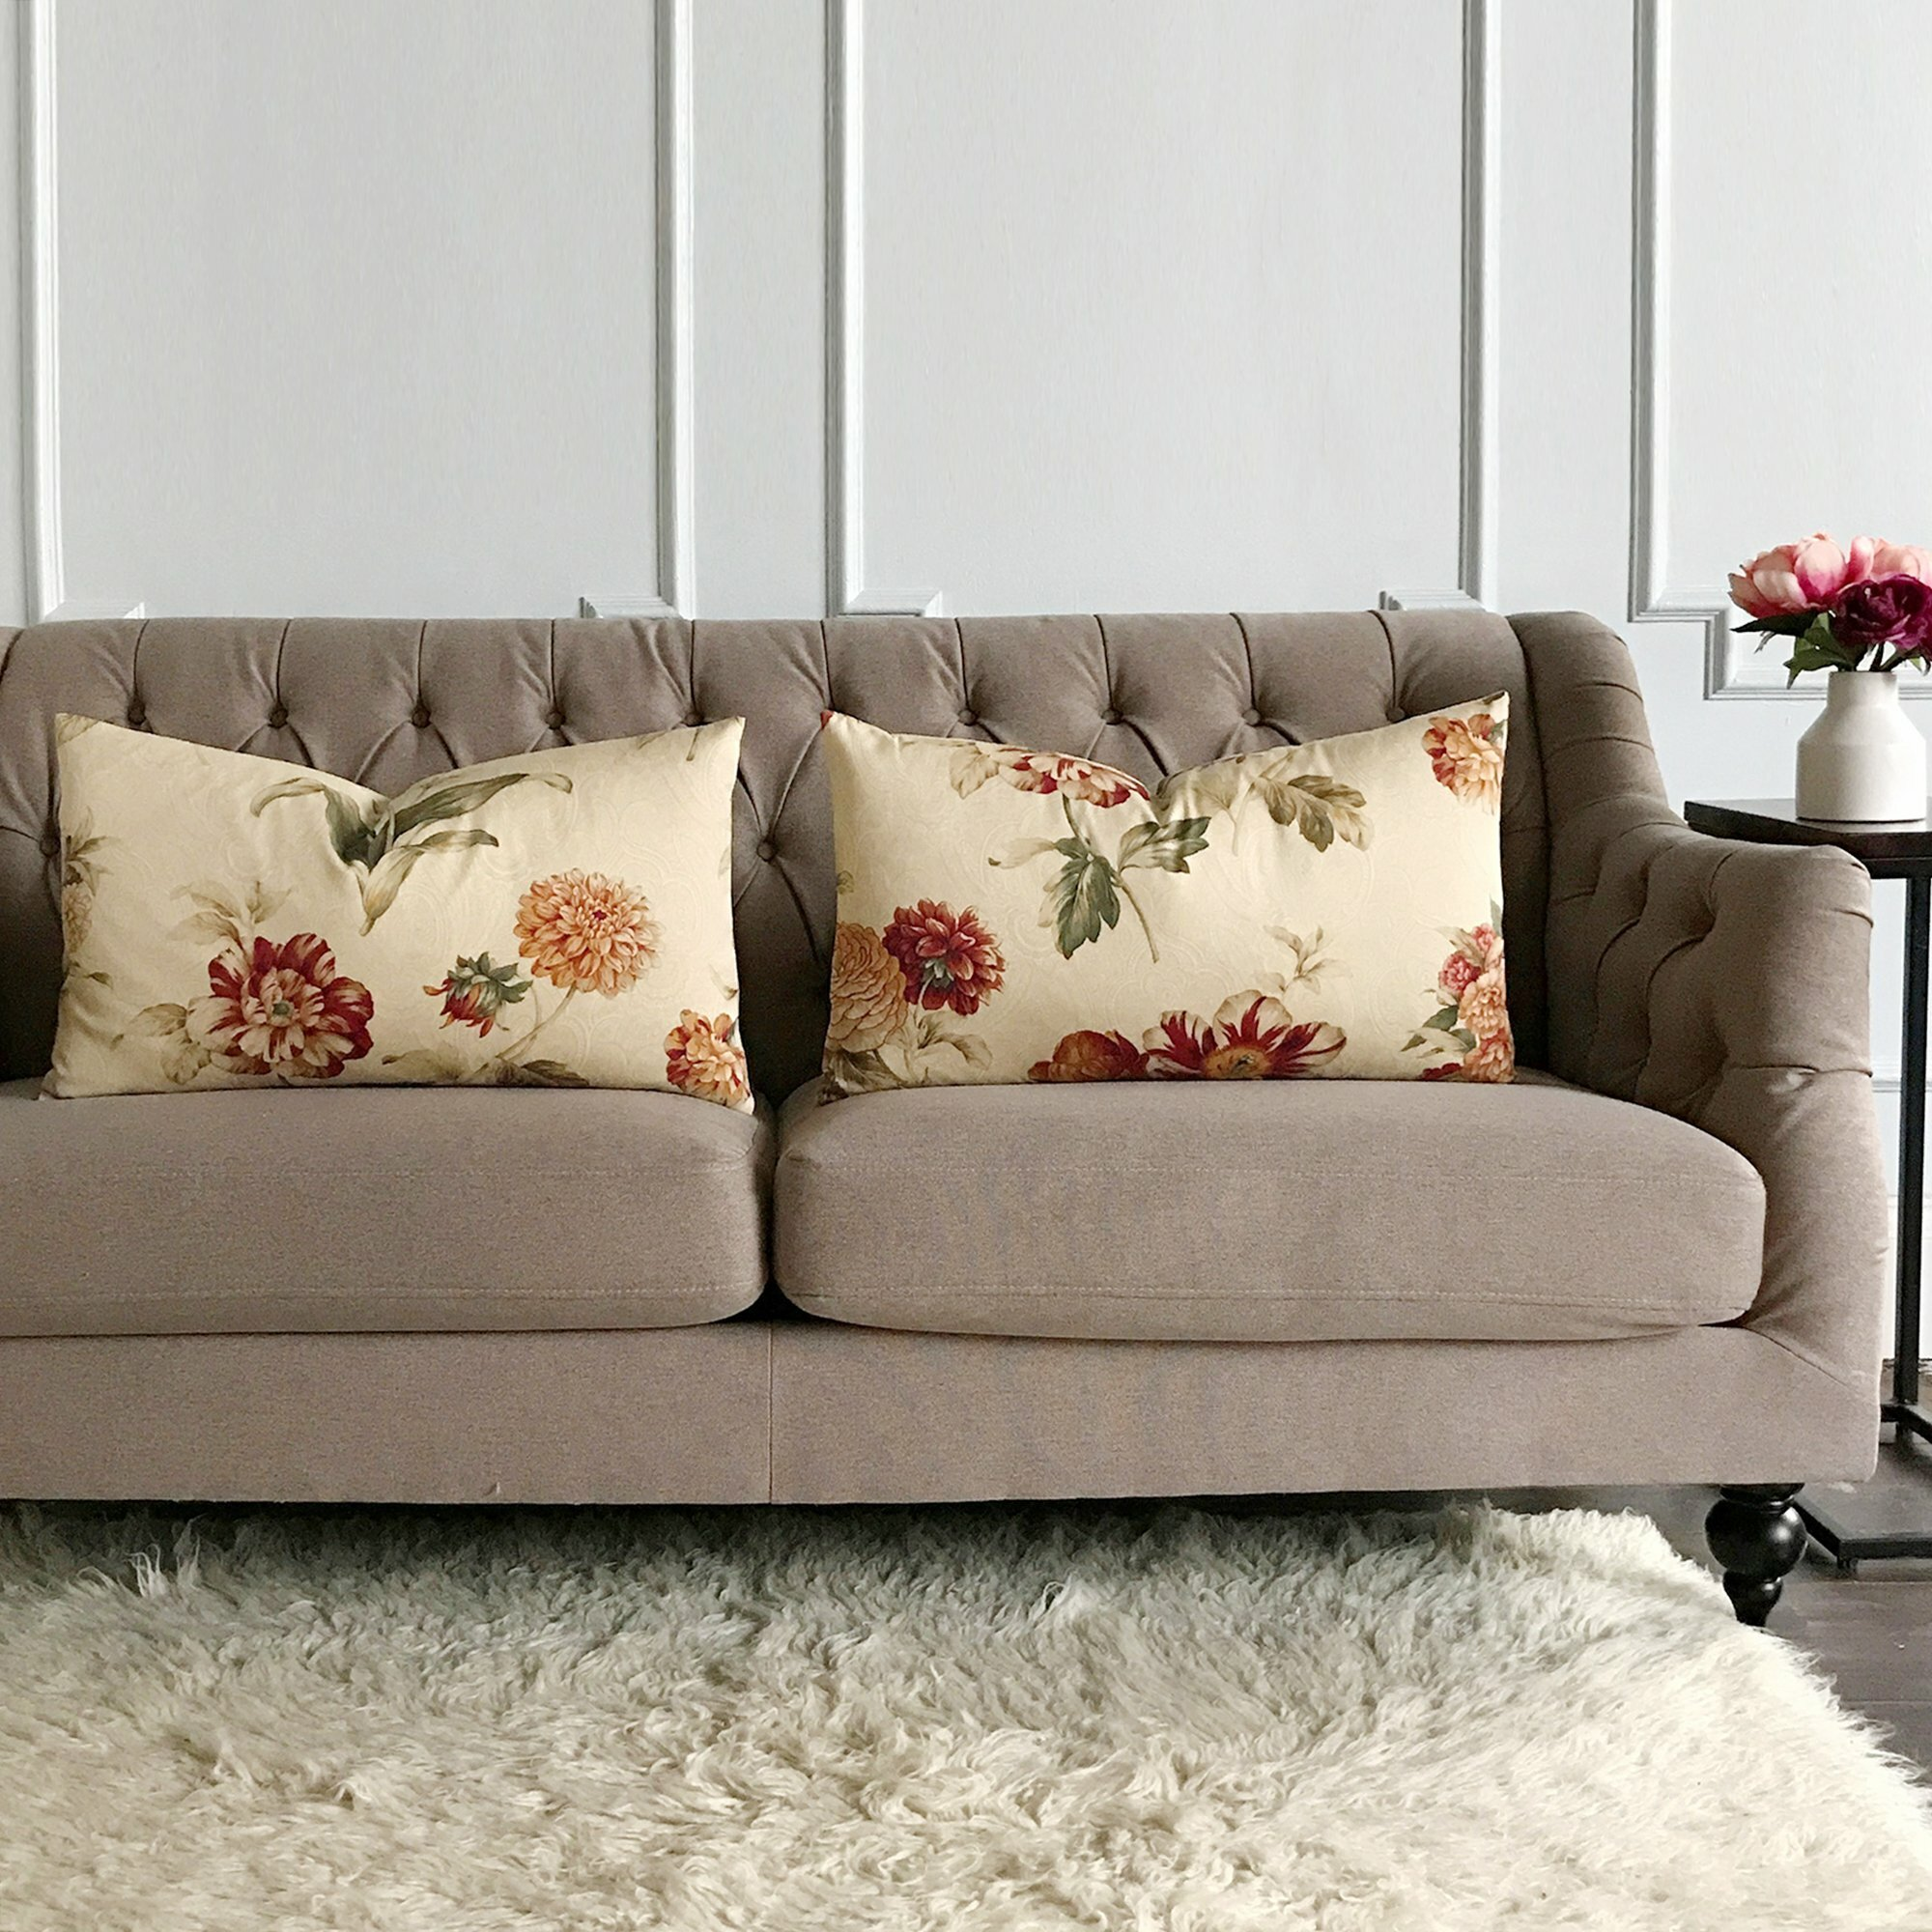 Jaworski Elegant Fl Luxury Decorative Pillow Cover